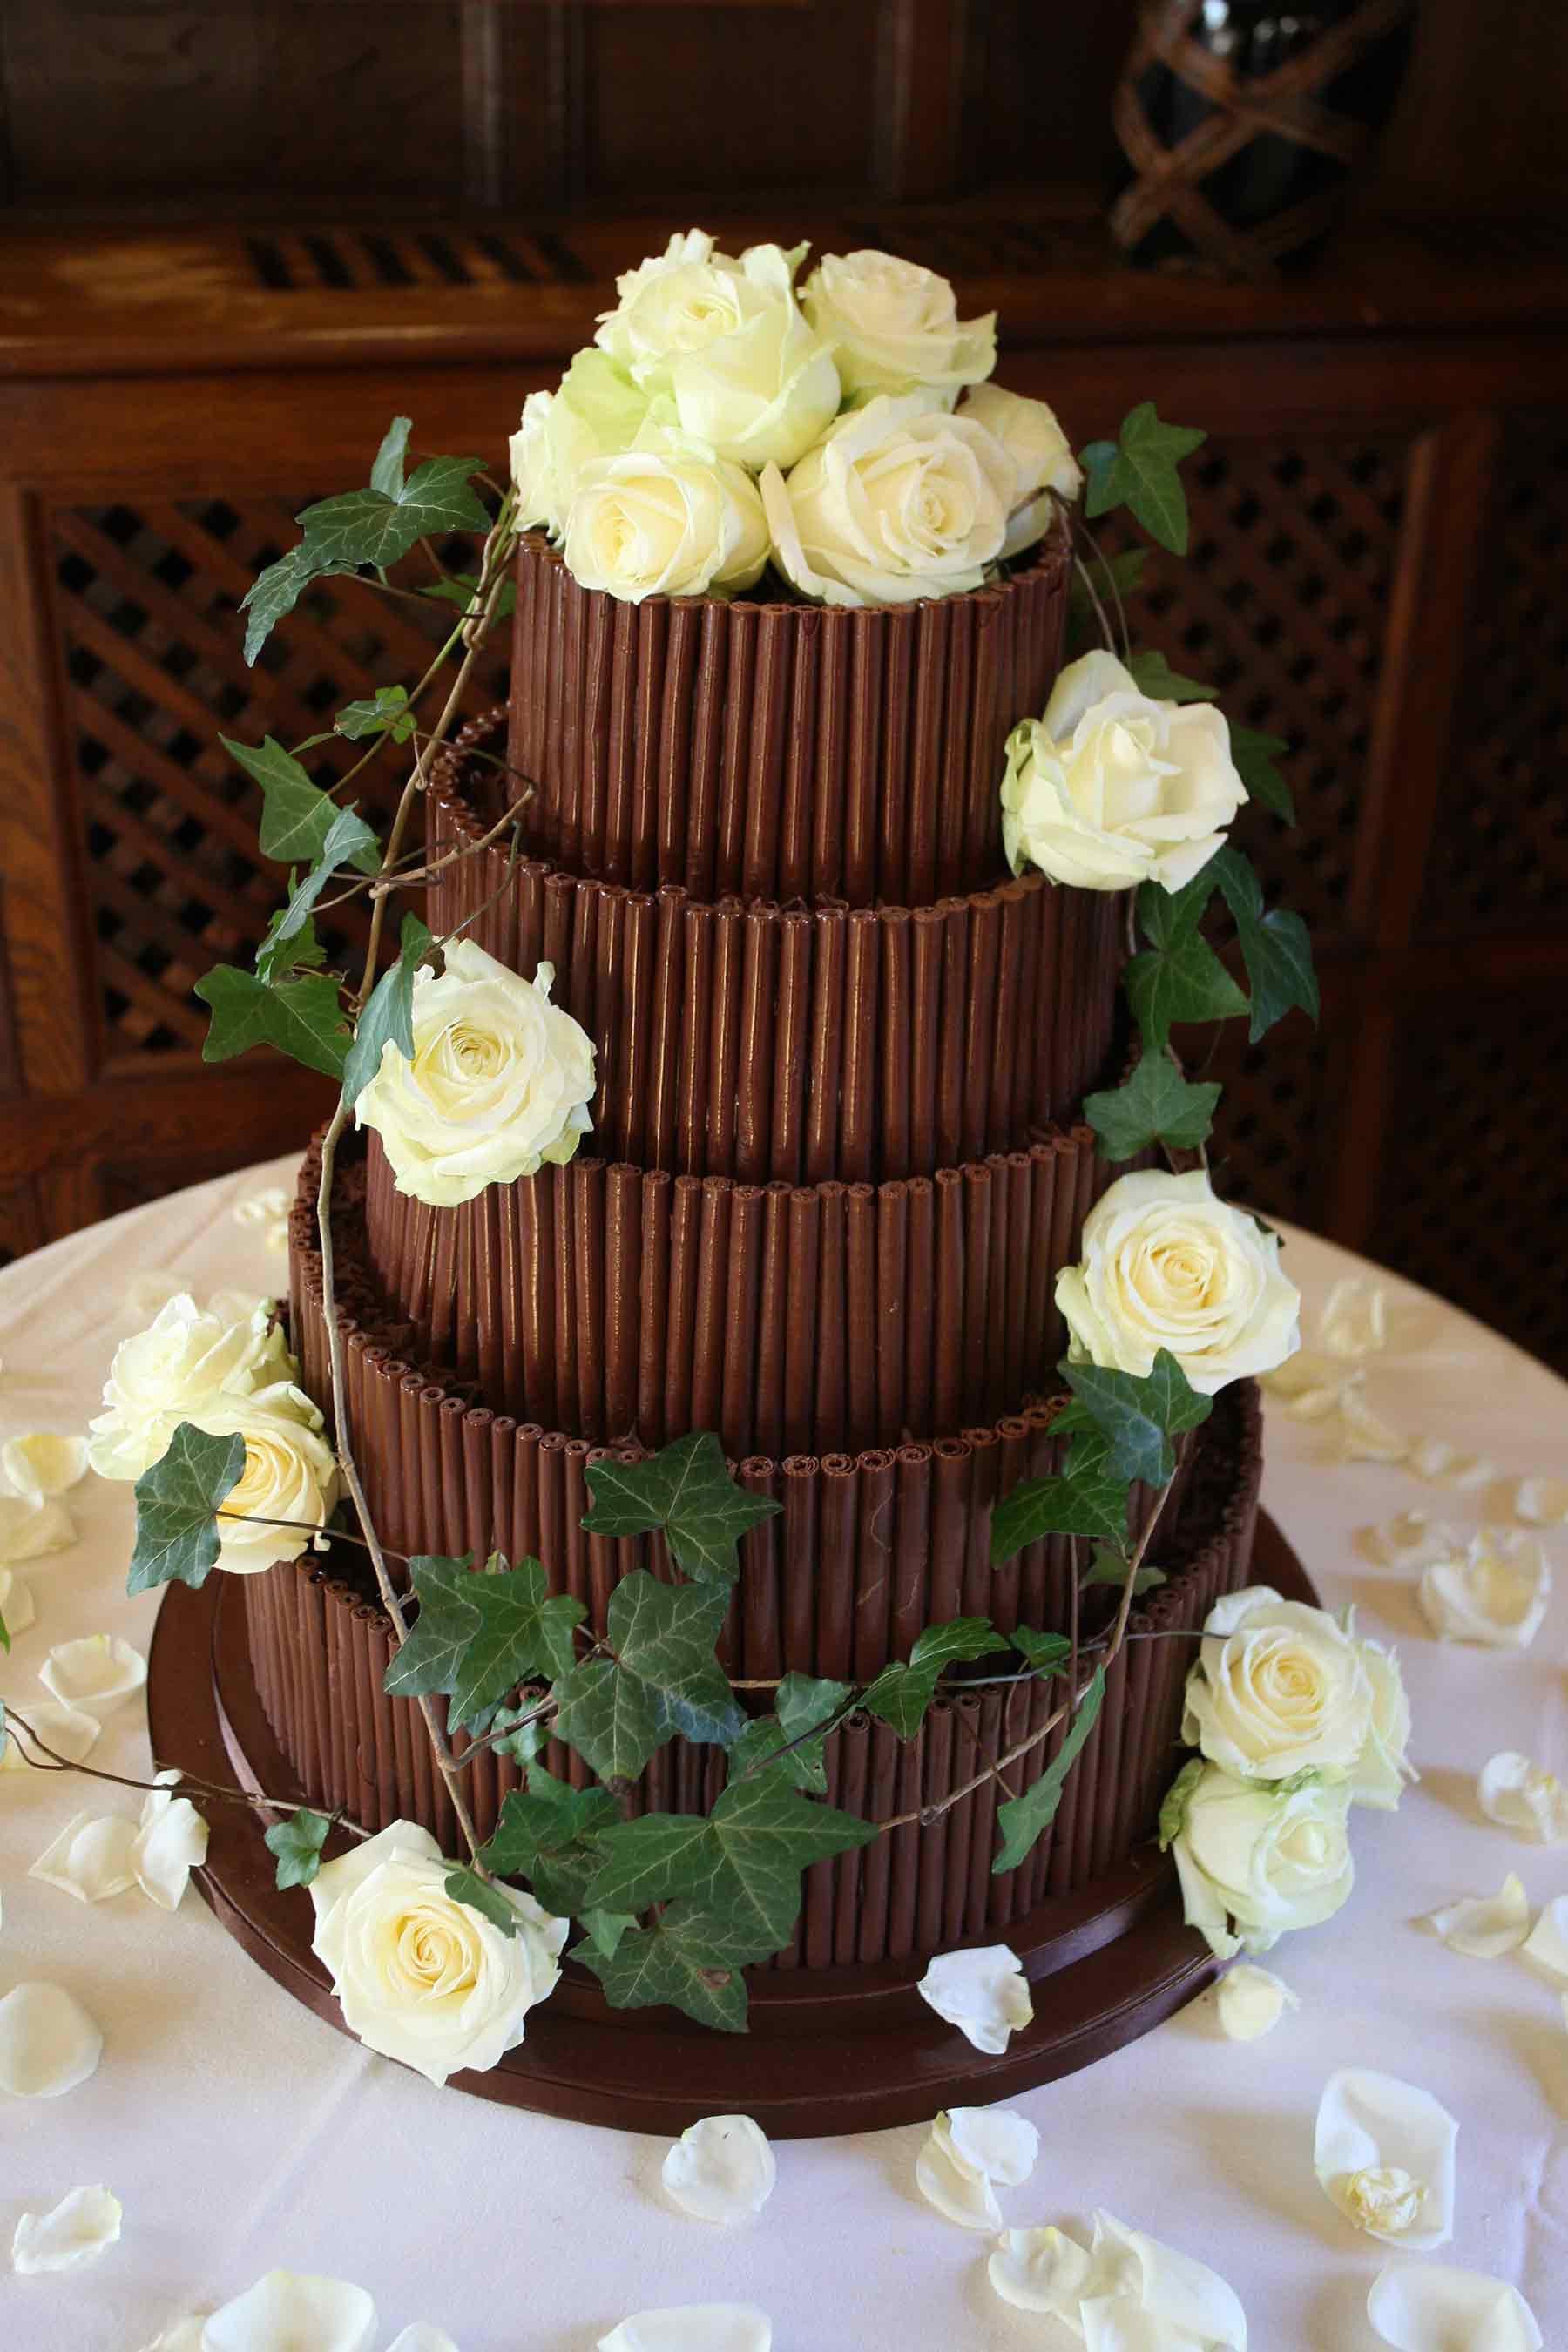 Wedding Cakes Decoration  Best Wedding Cake Designs for Your Inspiration Registaz